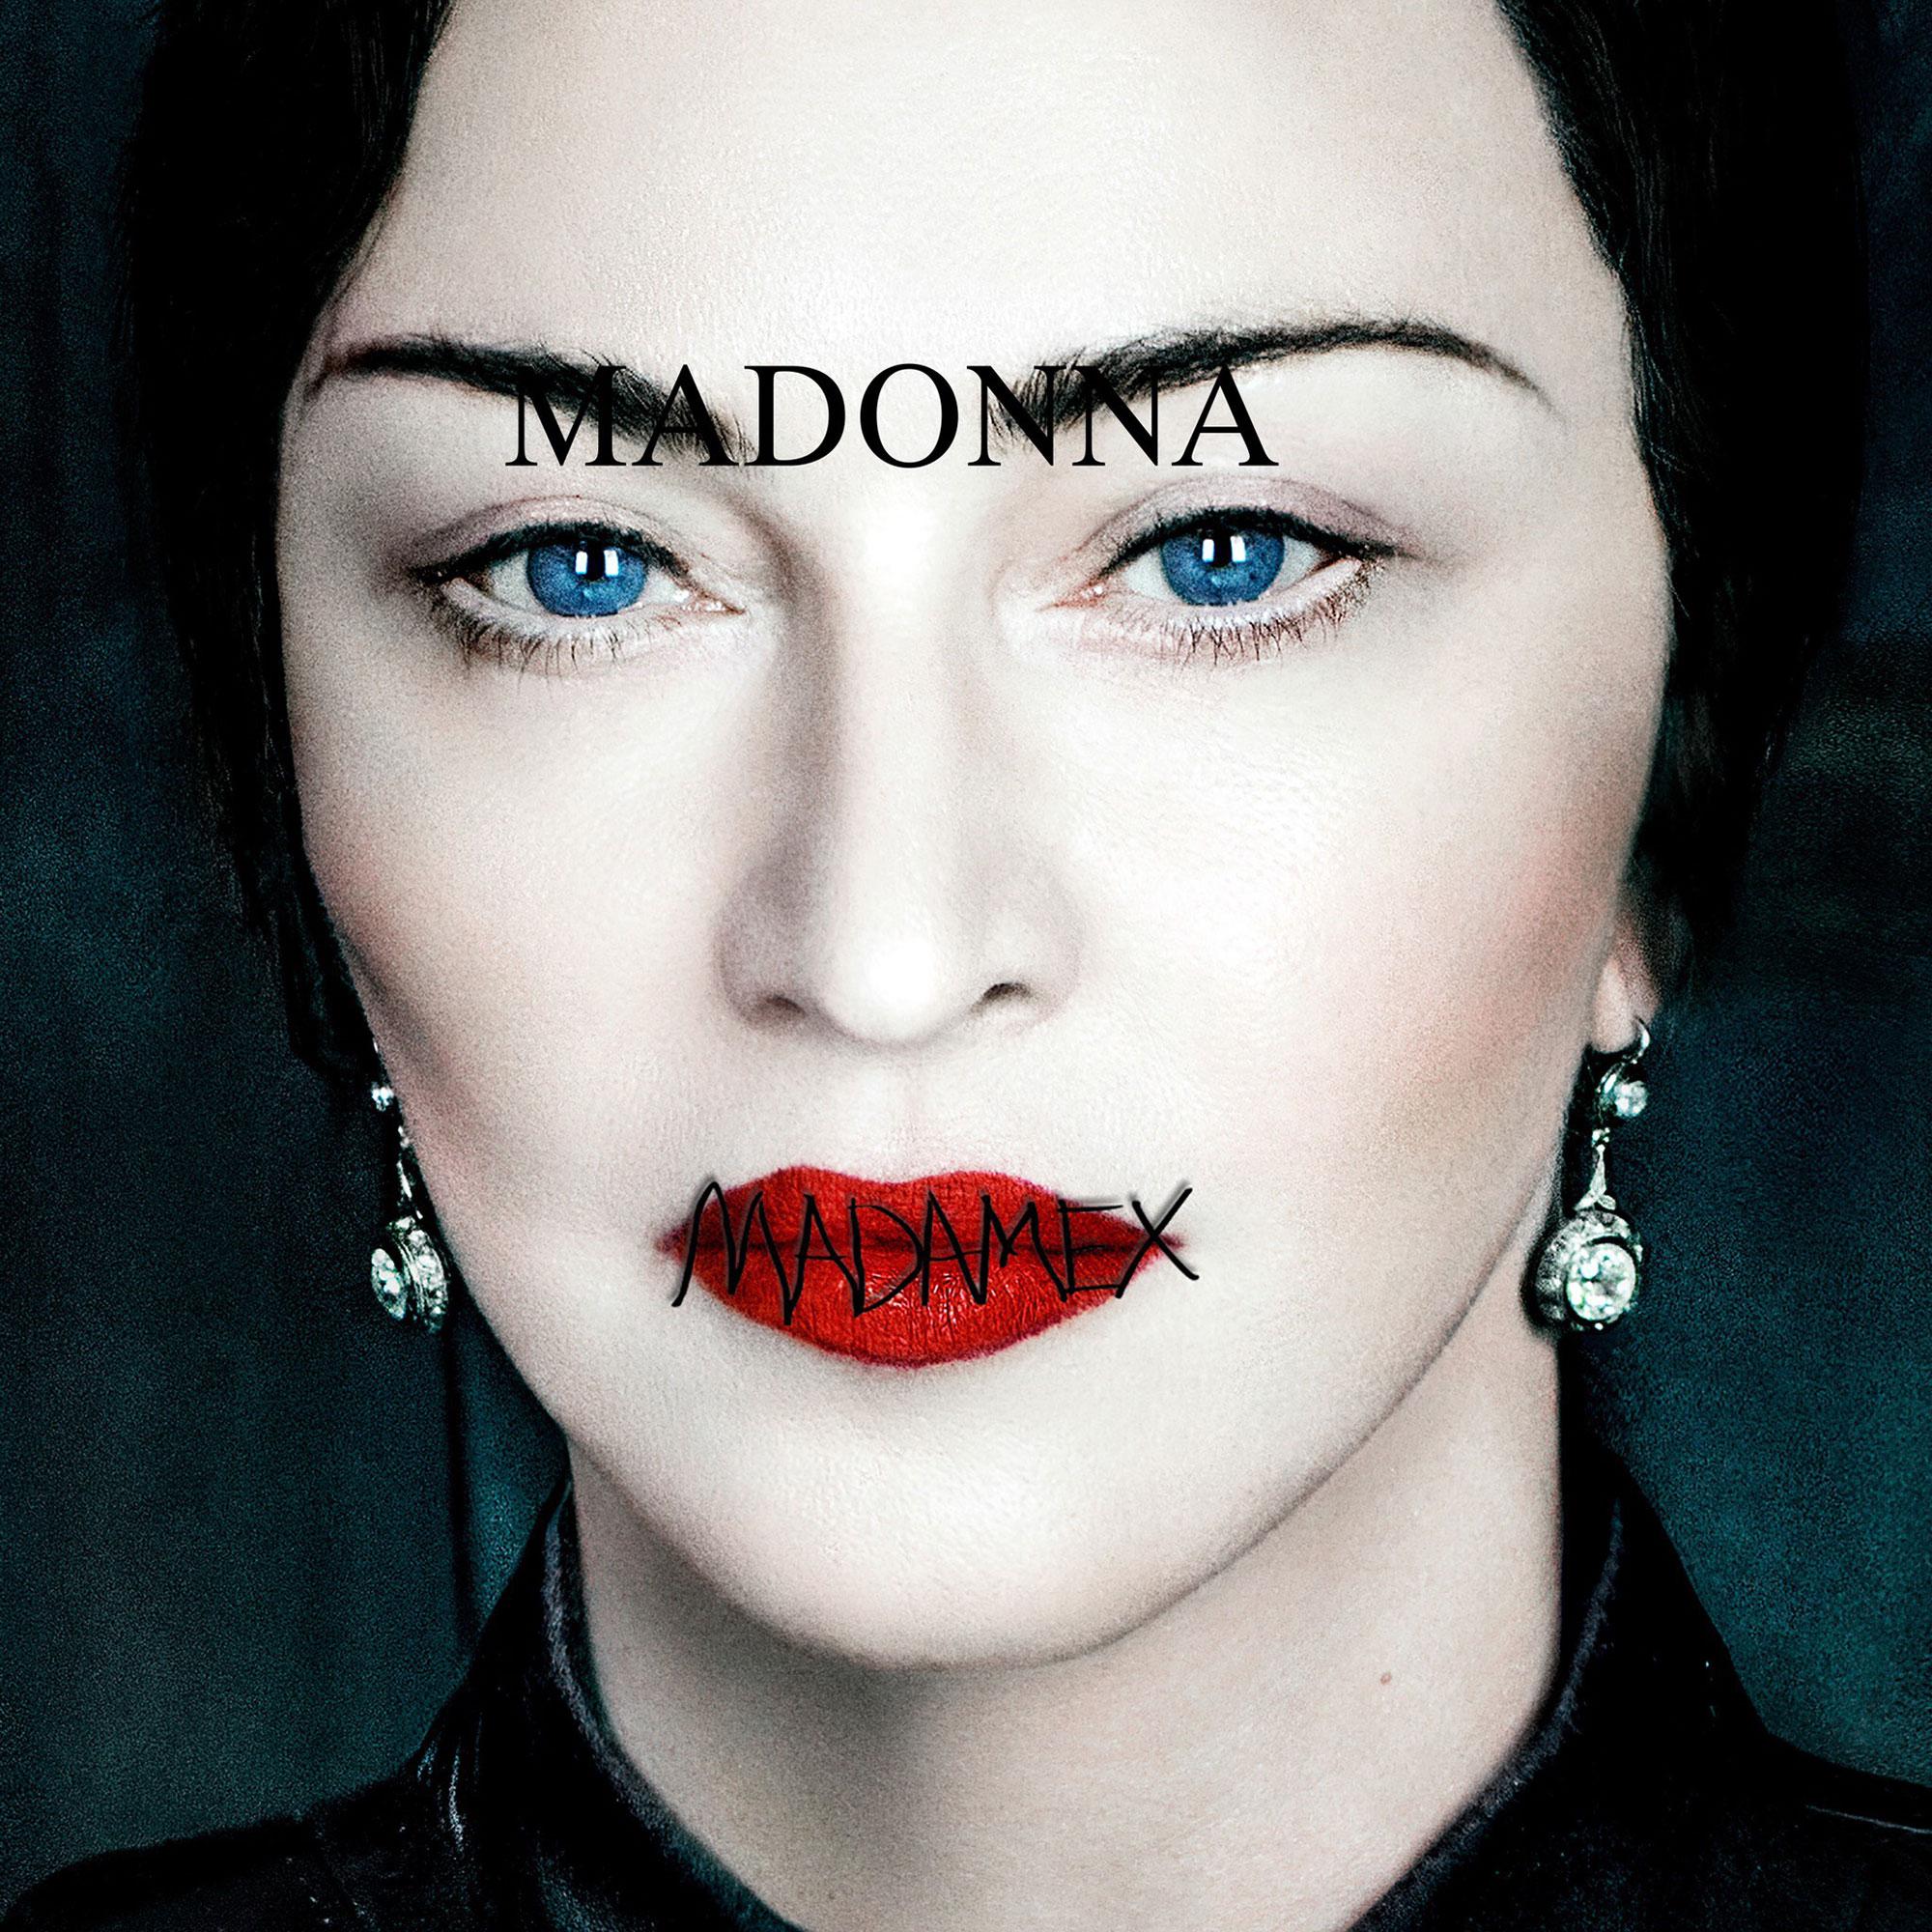 new madonna record 2